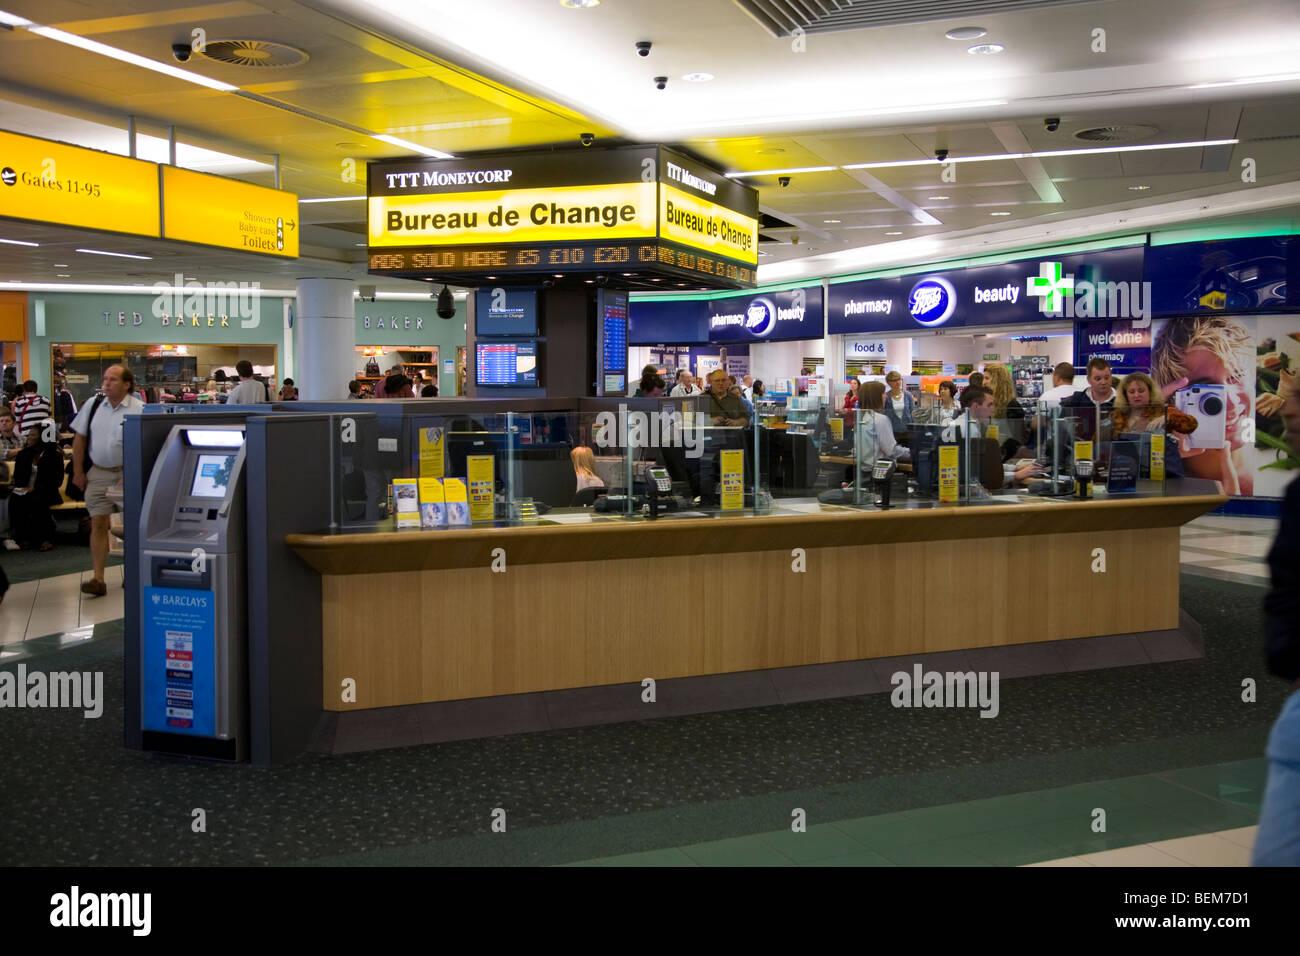 Gatwick south terminal stock photos gatwick south terminal stock images alamy - Bureau de change crawley ...